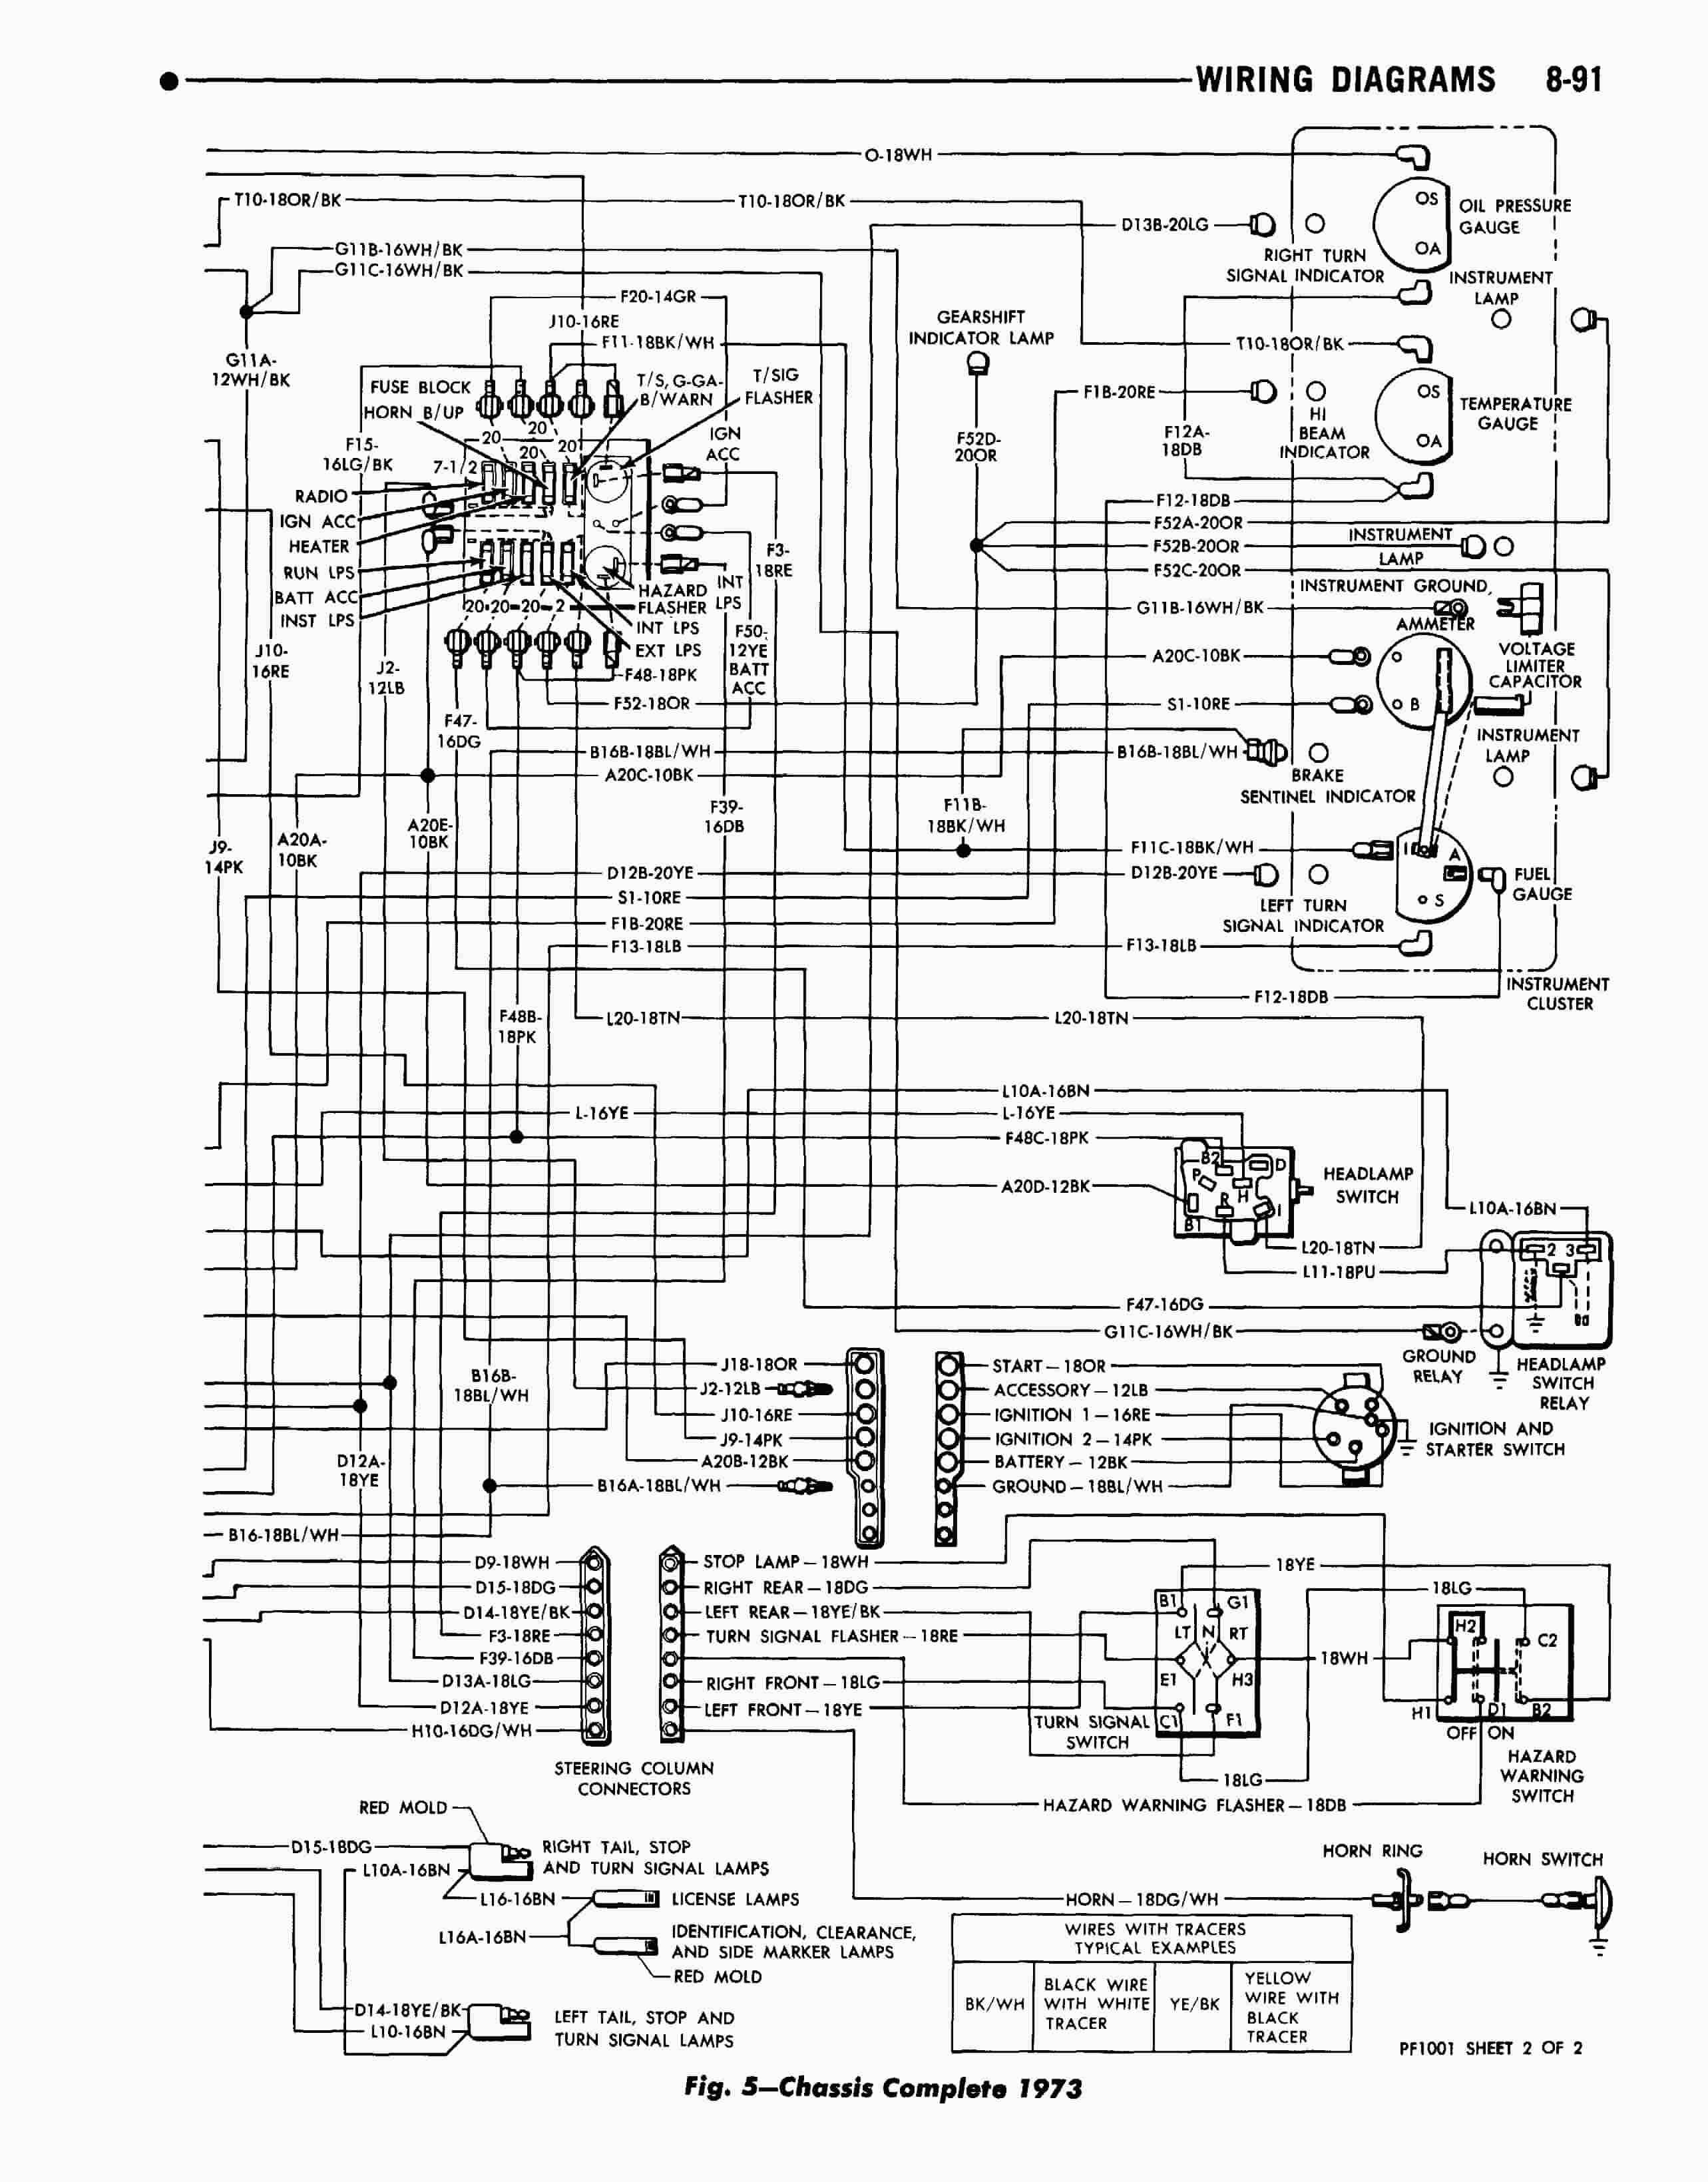 Southwind Motorhome Wiring Diagram - 11.fuss-atelier.de • on gmc fuse box diagrams, friendship bracelet diagrams, snatch block diagrams, electronic circuit diagrams, engine diagrams, sincgars radio configurations diagrams, pinout diagrams, internet of things diagrams, transformer diagrams, led circuit diagrams, motor diagrams, switch diagrams, series and parallel circuits diagrams, troubleshooting diagrams, smart car diagrams, electrical diagrams, honda motorcycle repair diagrams, lighting diagrams, hvac diagrams, battery diagrams,